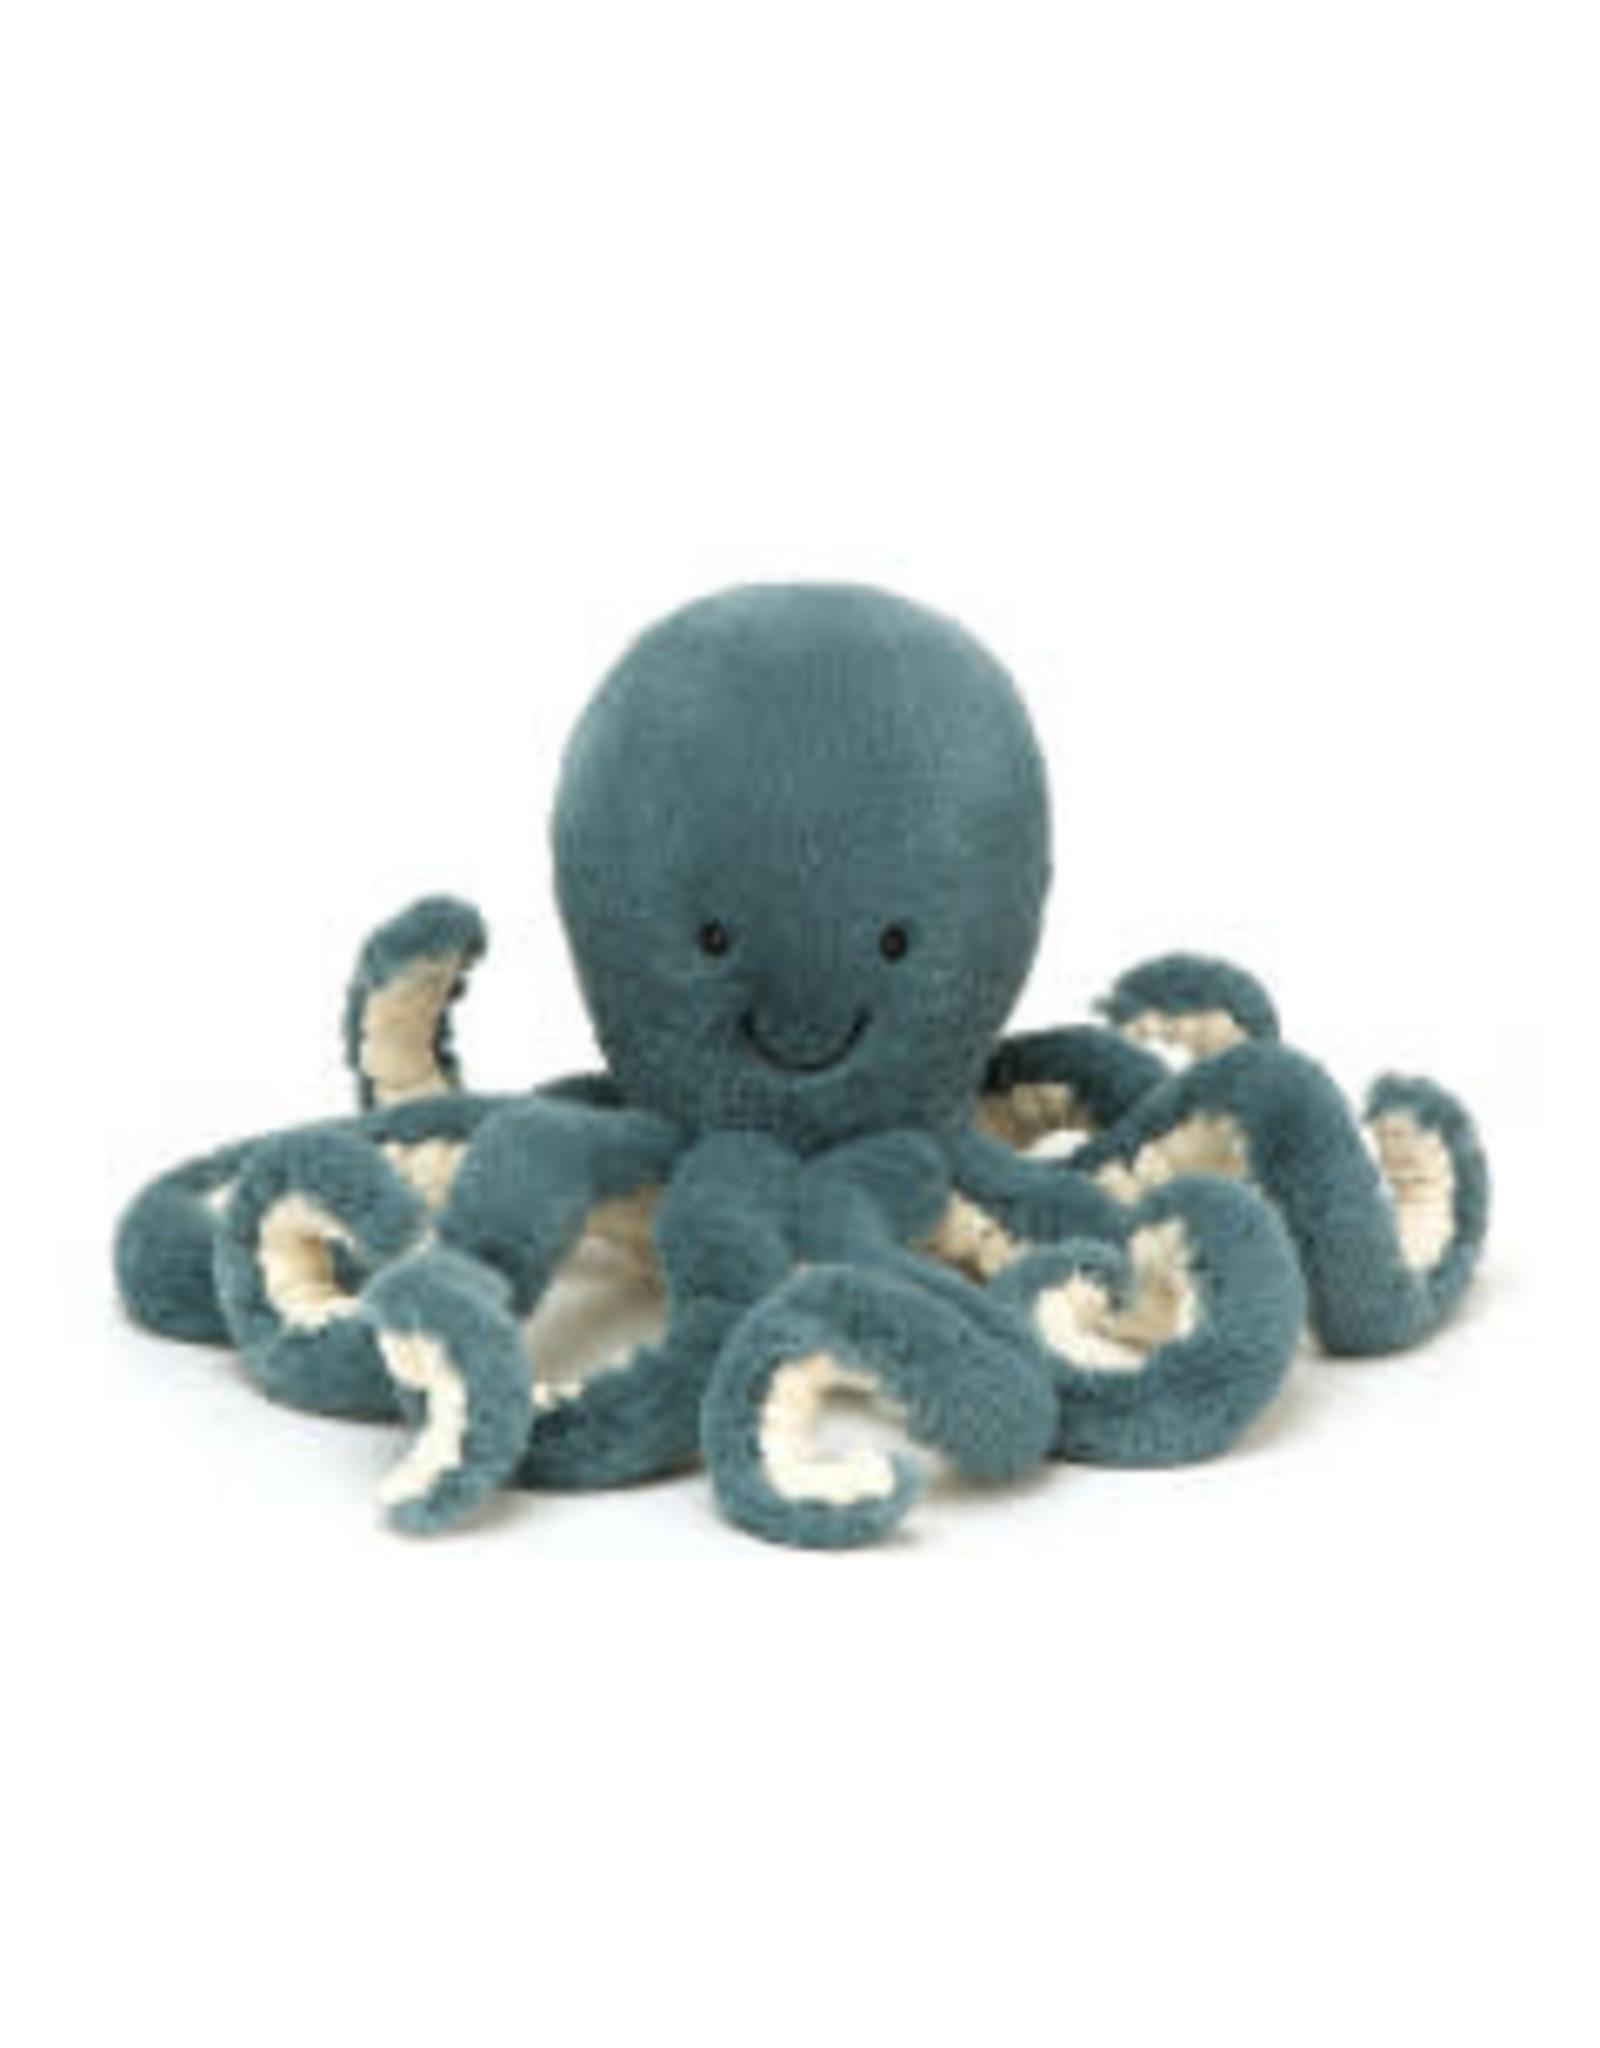 Octopus Storm Little REG AJ